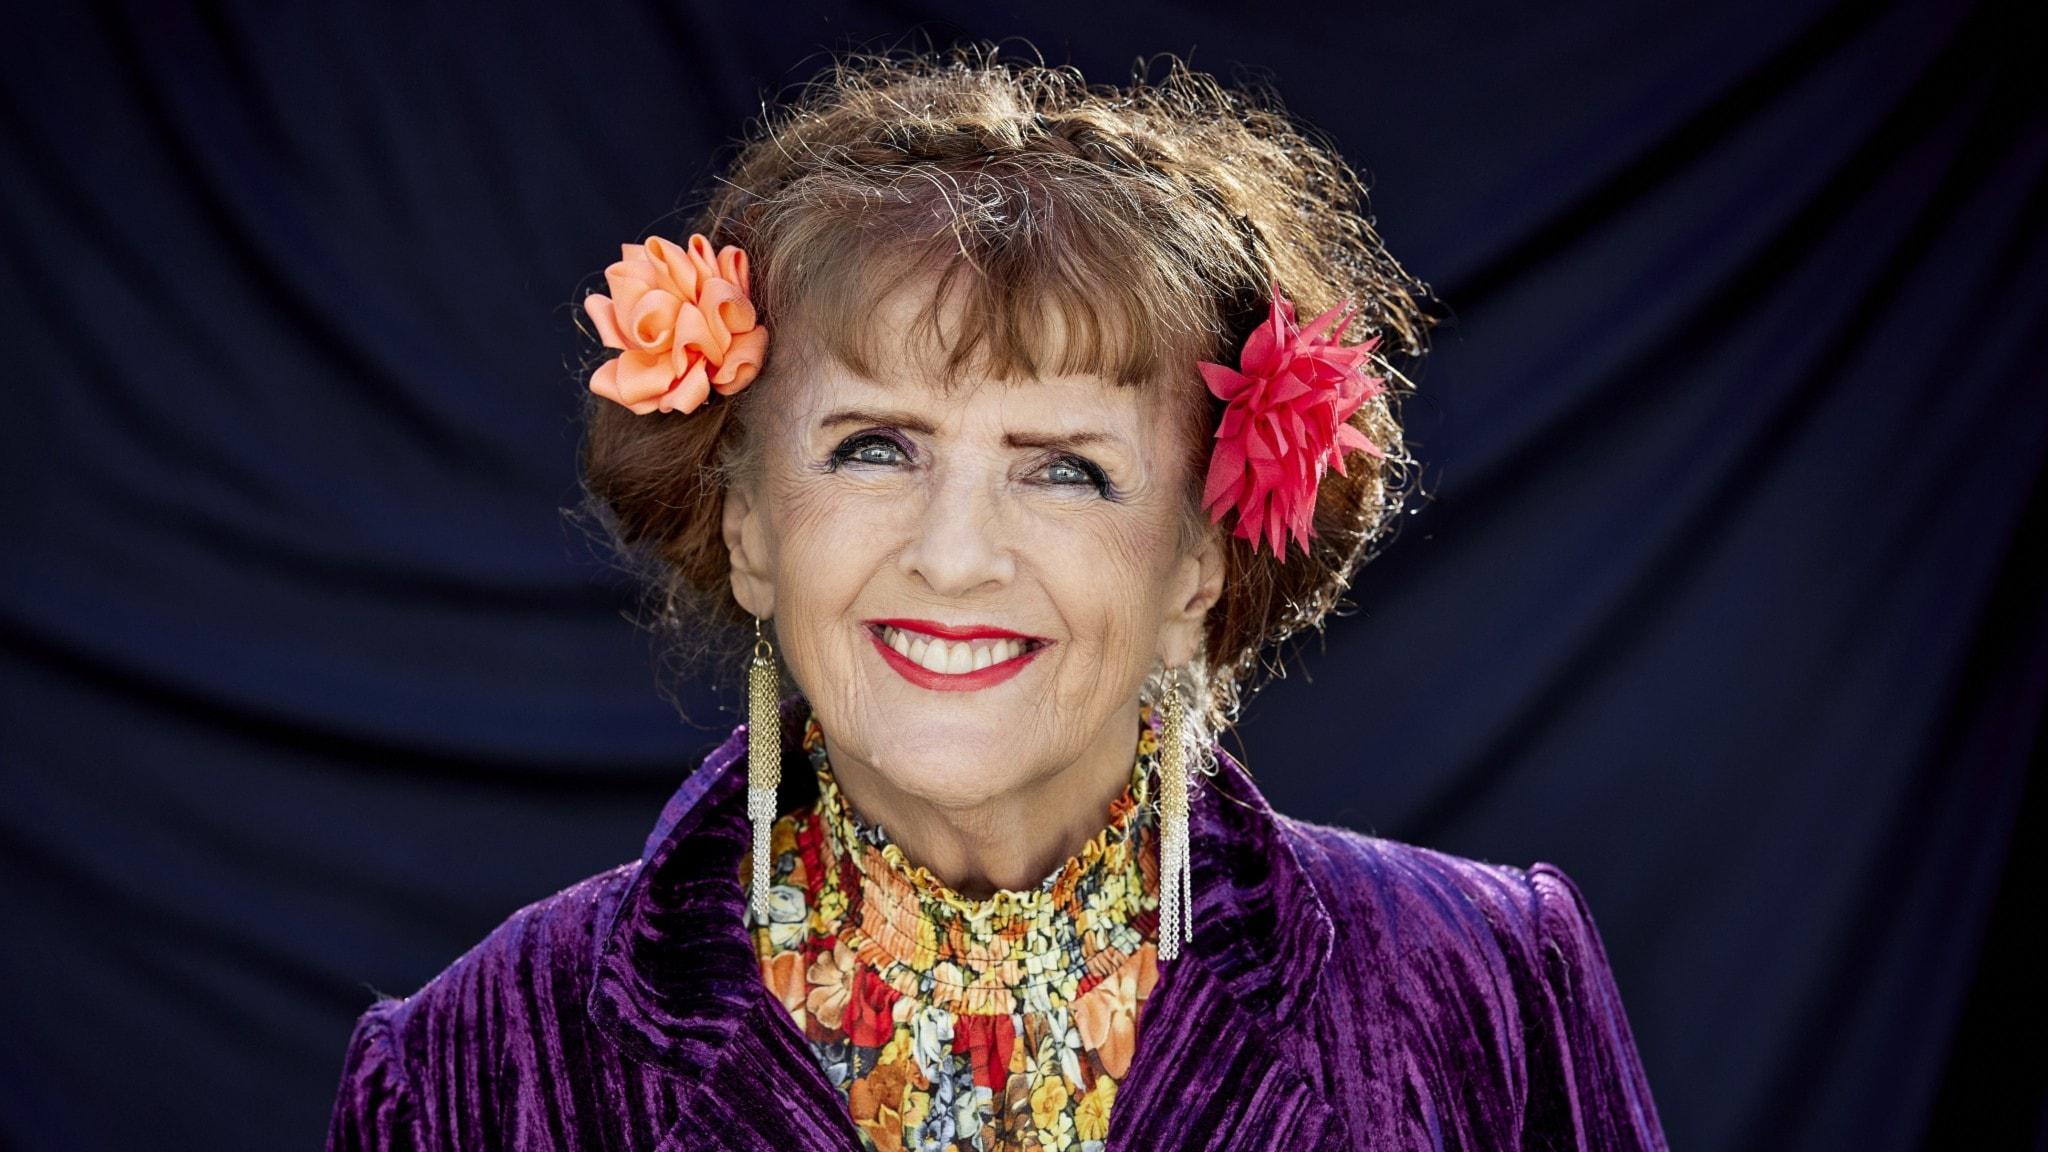 Elisabeth Höglund: